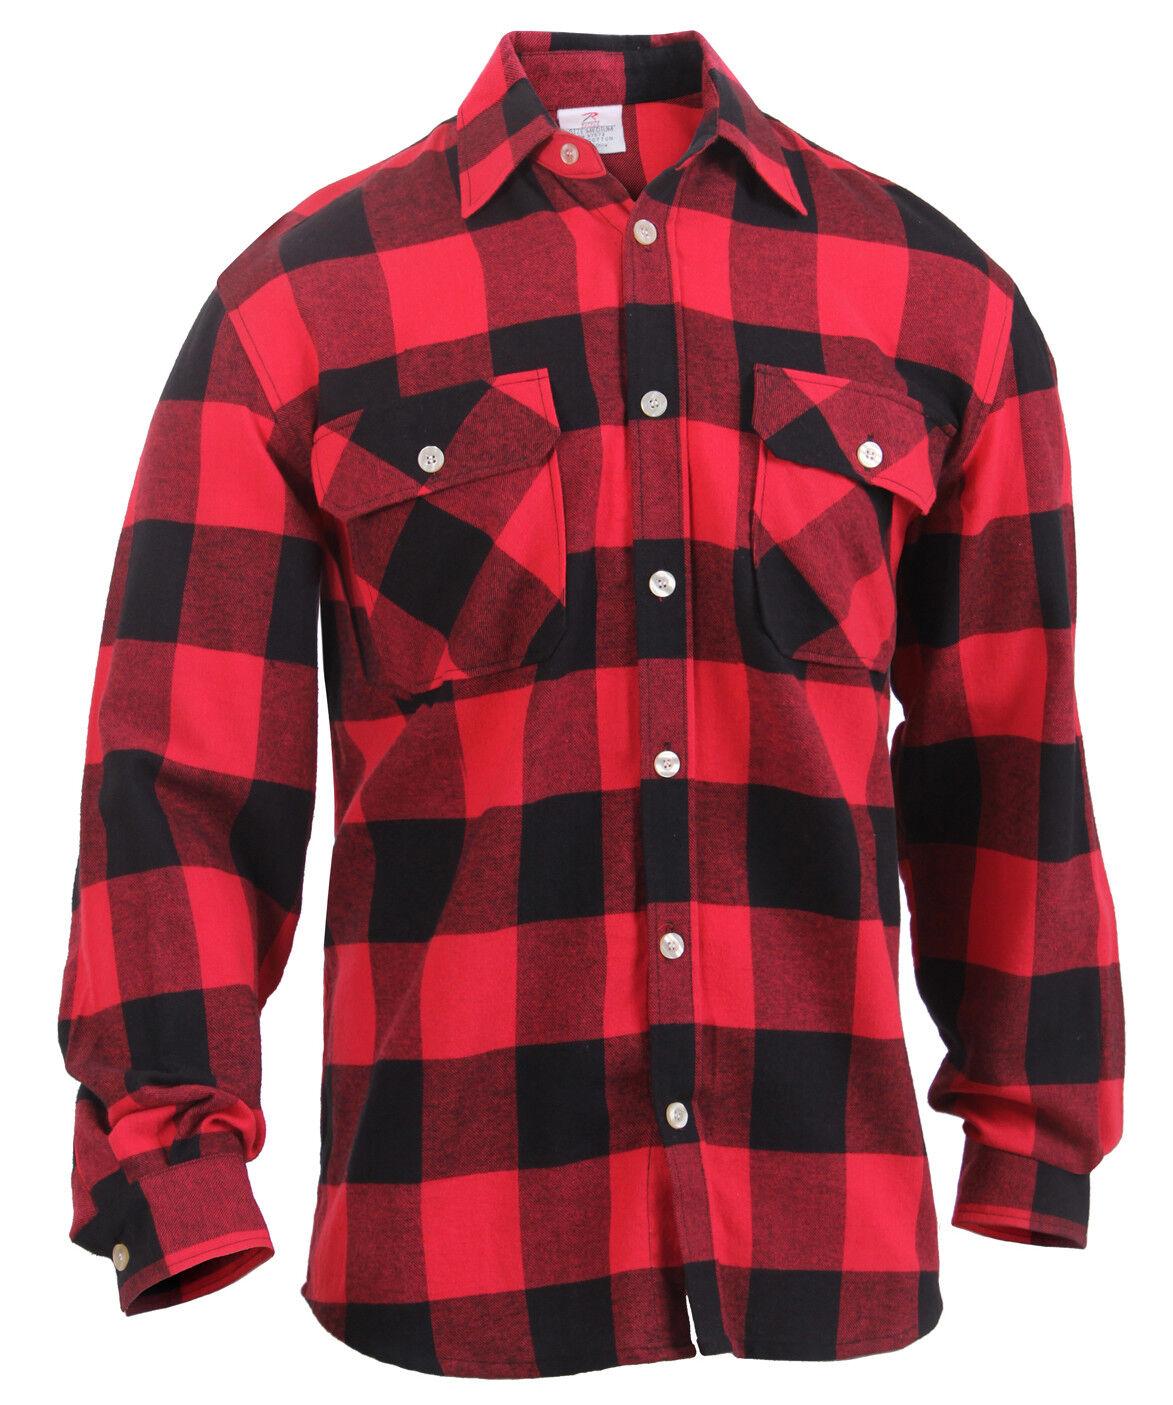 Mens Brawny Red Buffalo Plaid Flannel Shirt Long Sleeve Lightweight redhco 1190